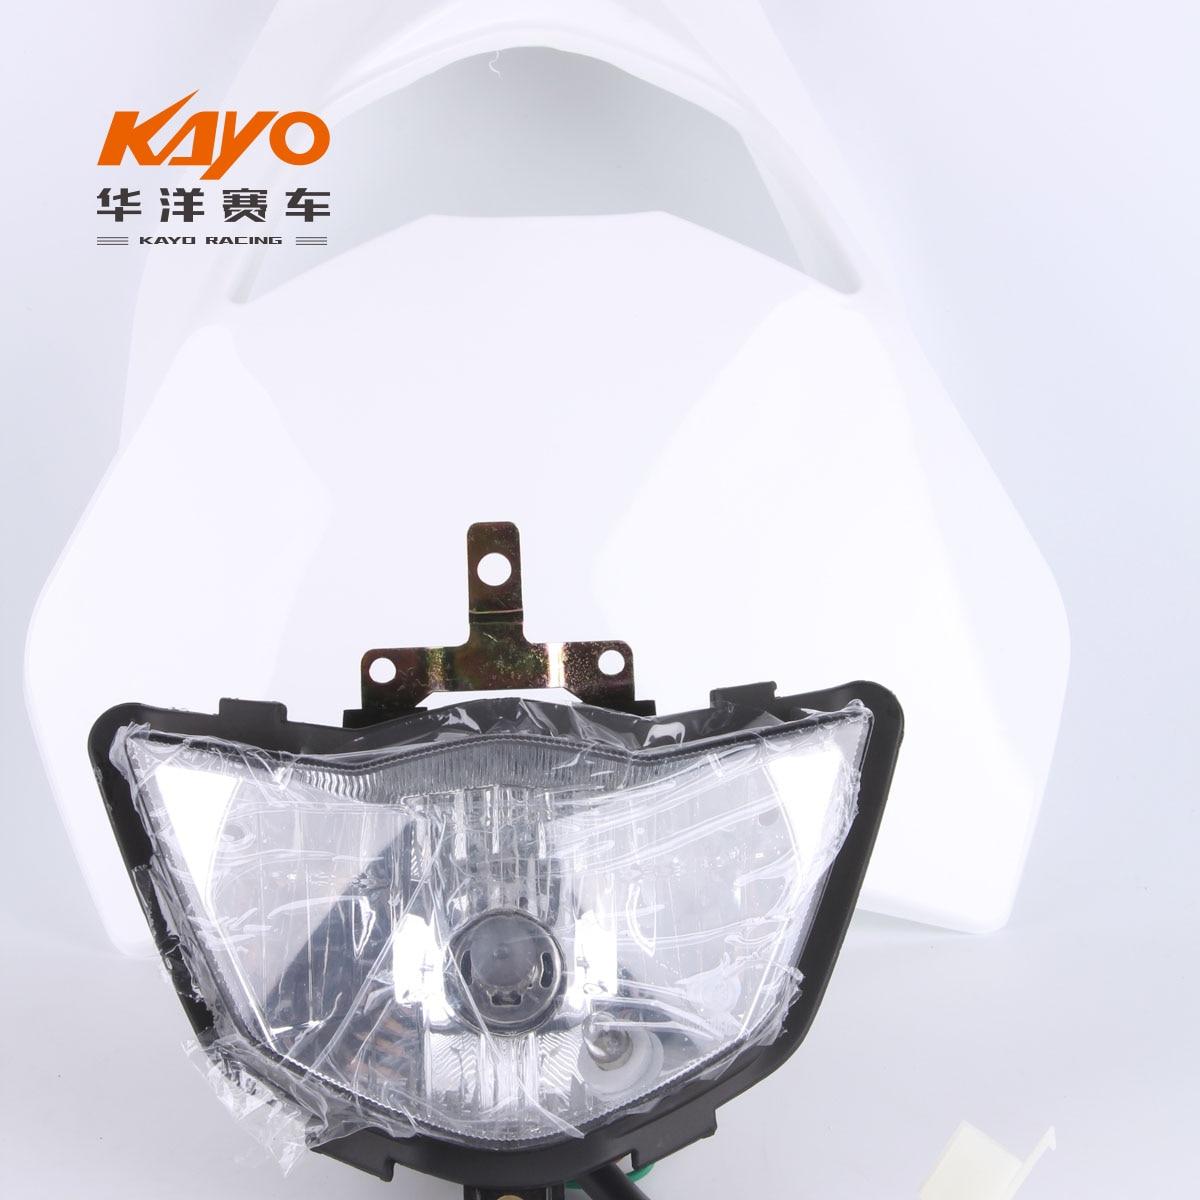 Huayang kayo 2016 t2 t4 general off-road motorcycle headlight DIRT PIT bike head lamp light Huayang kayo 2016 t2 t4 general off-road motorcycle headlight DIRT PIT bike head lamp light